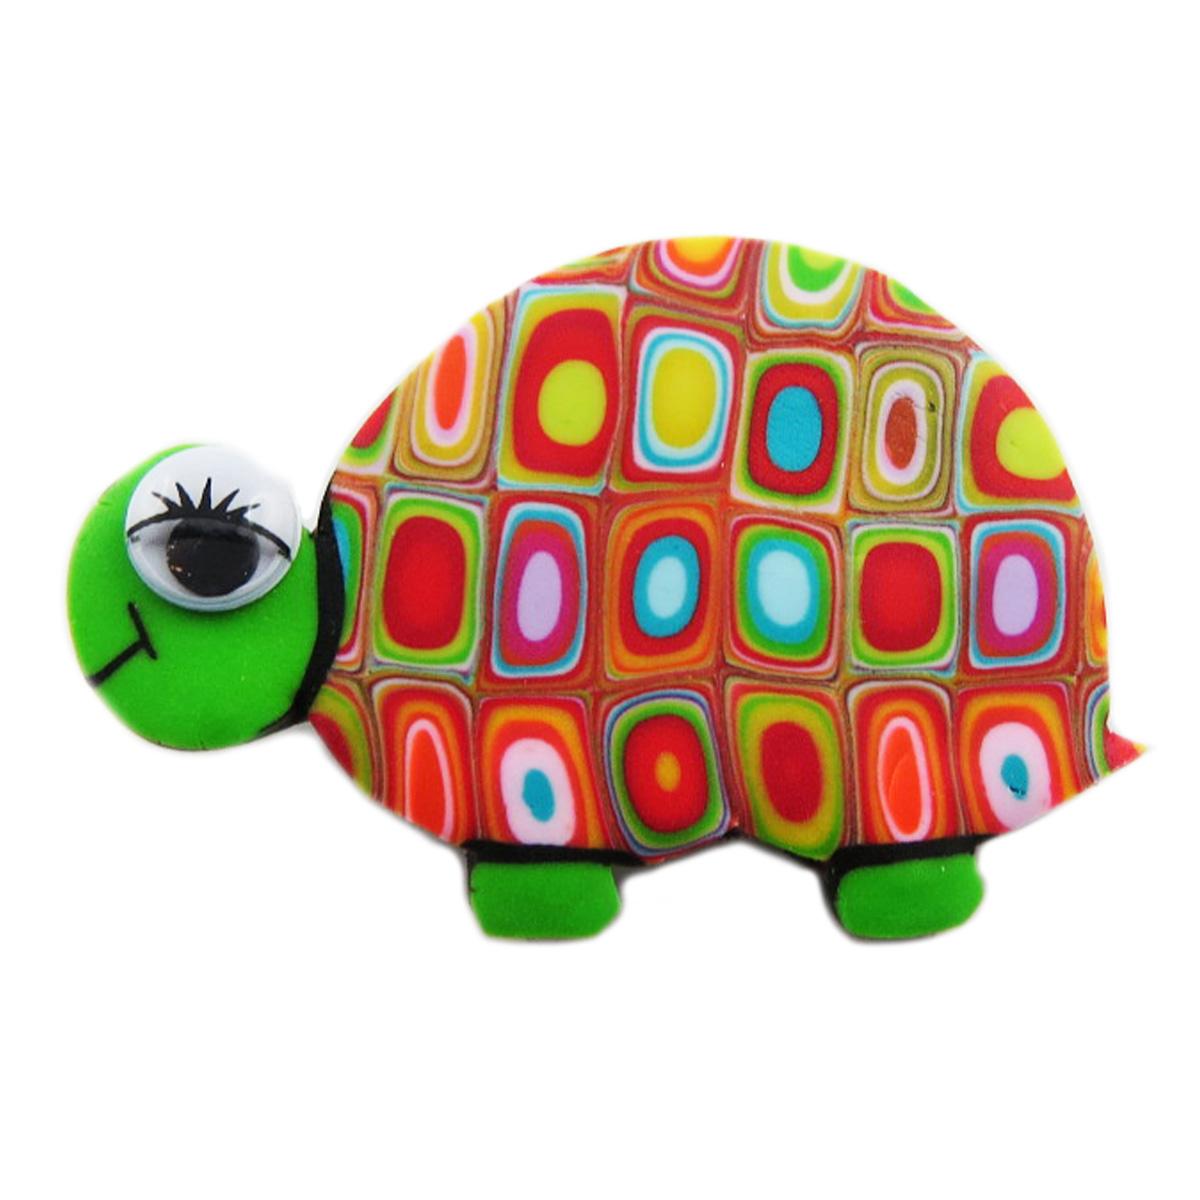 Broche artisanale \'Colombine & Arlequin\' vert multicolore (tortue) - 45x30 mm - [R1338]